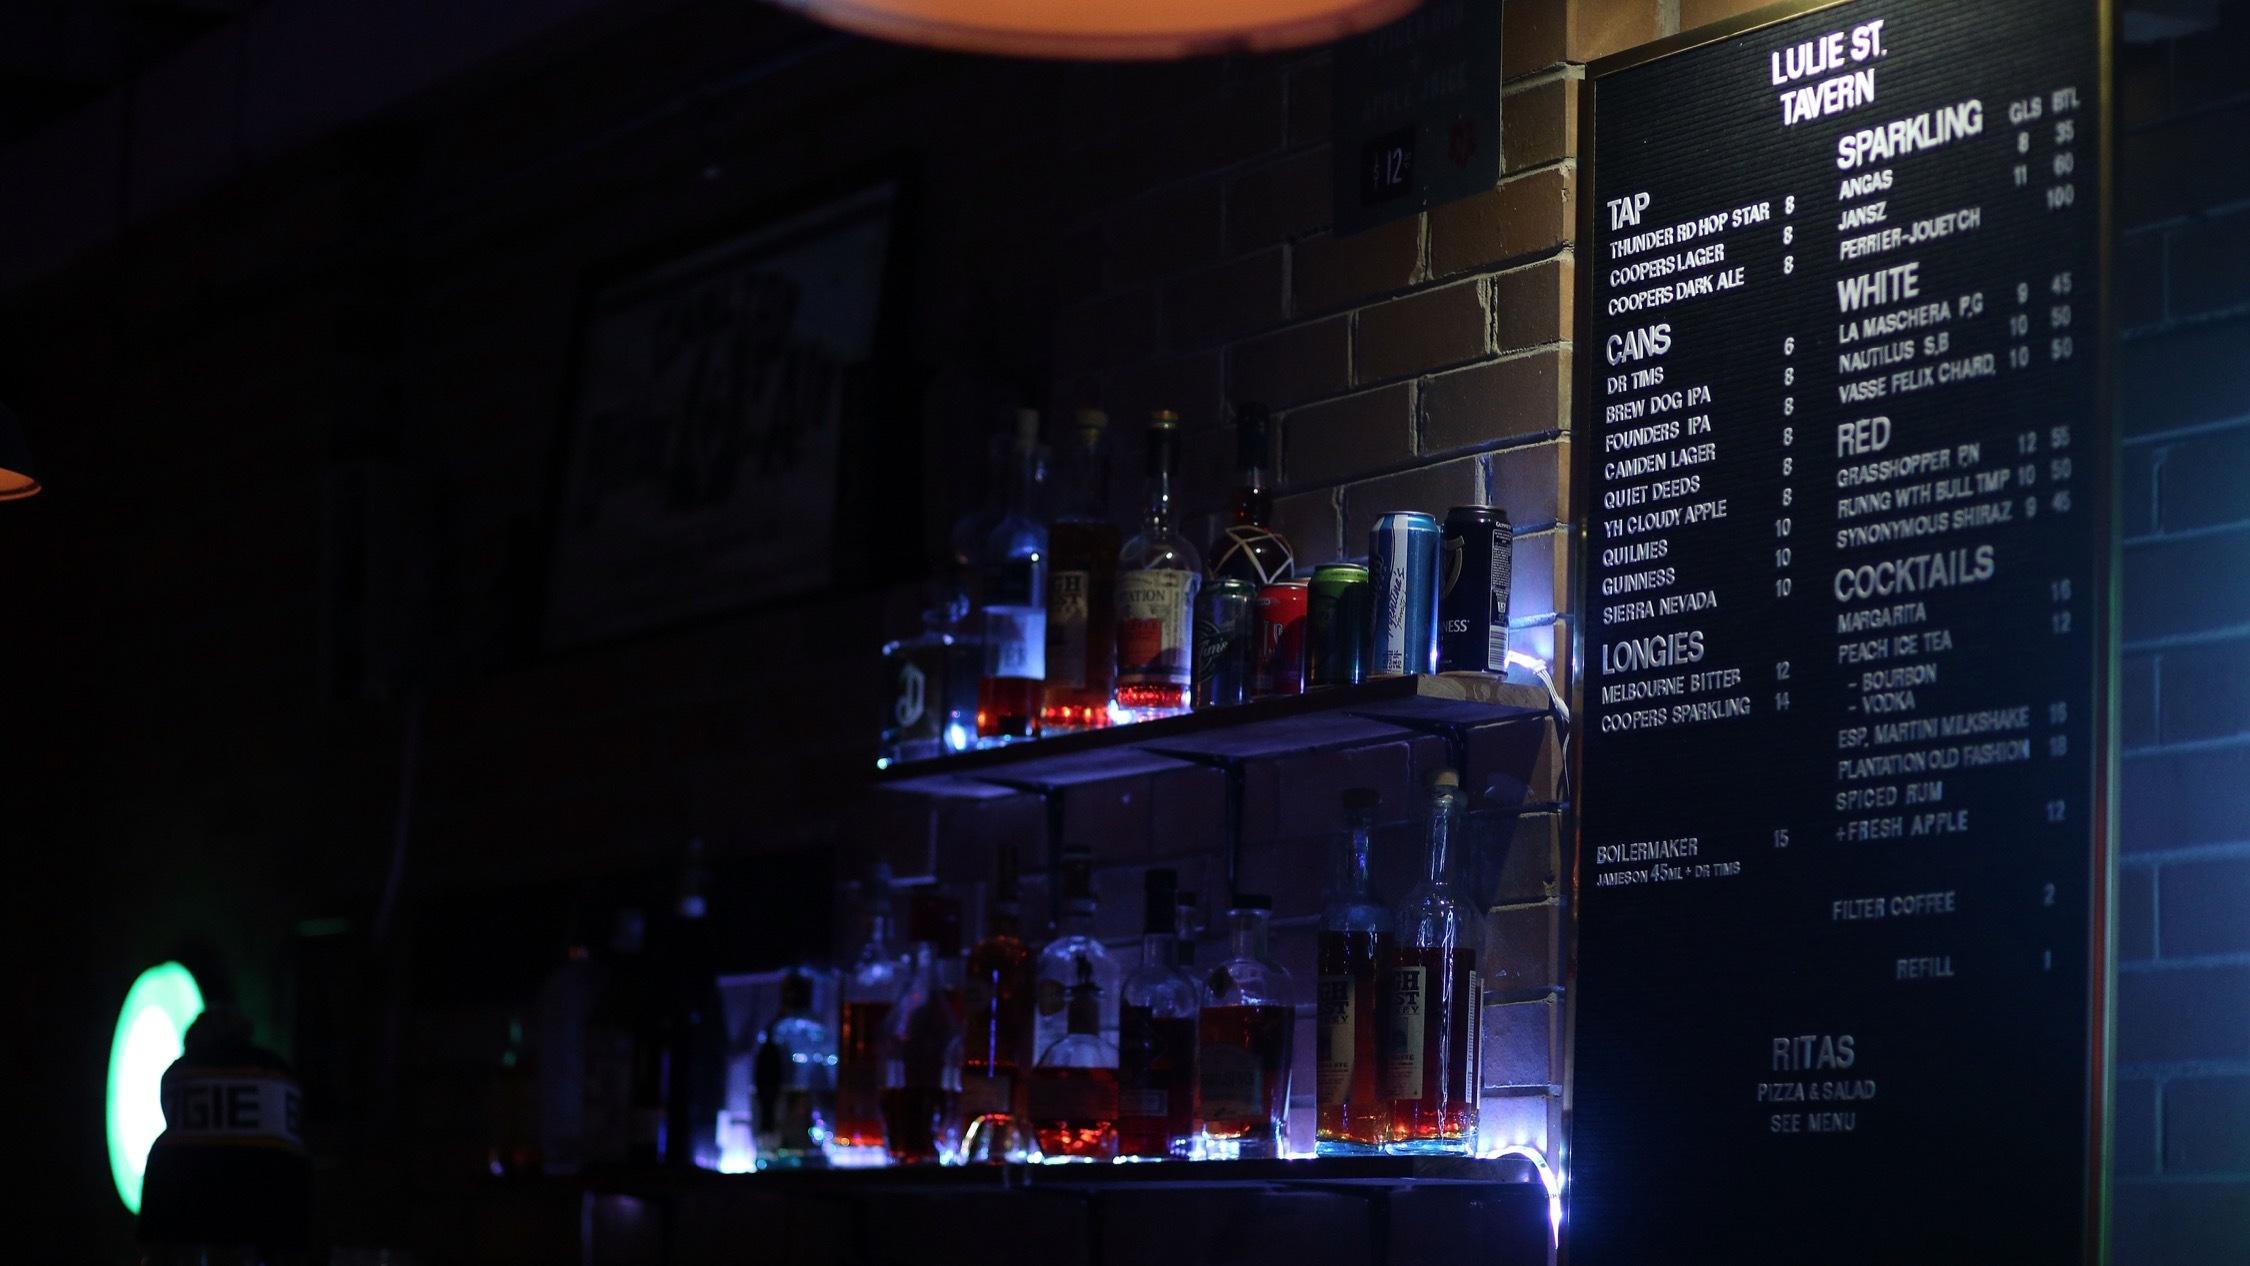 Lulie St Tavern